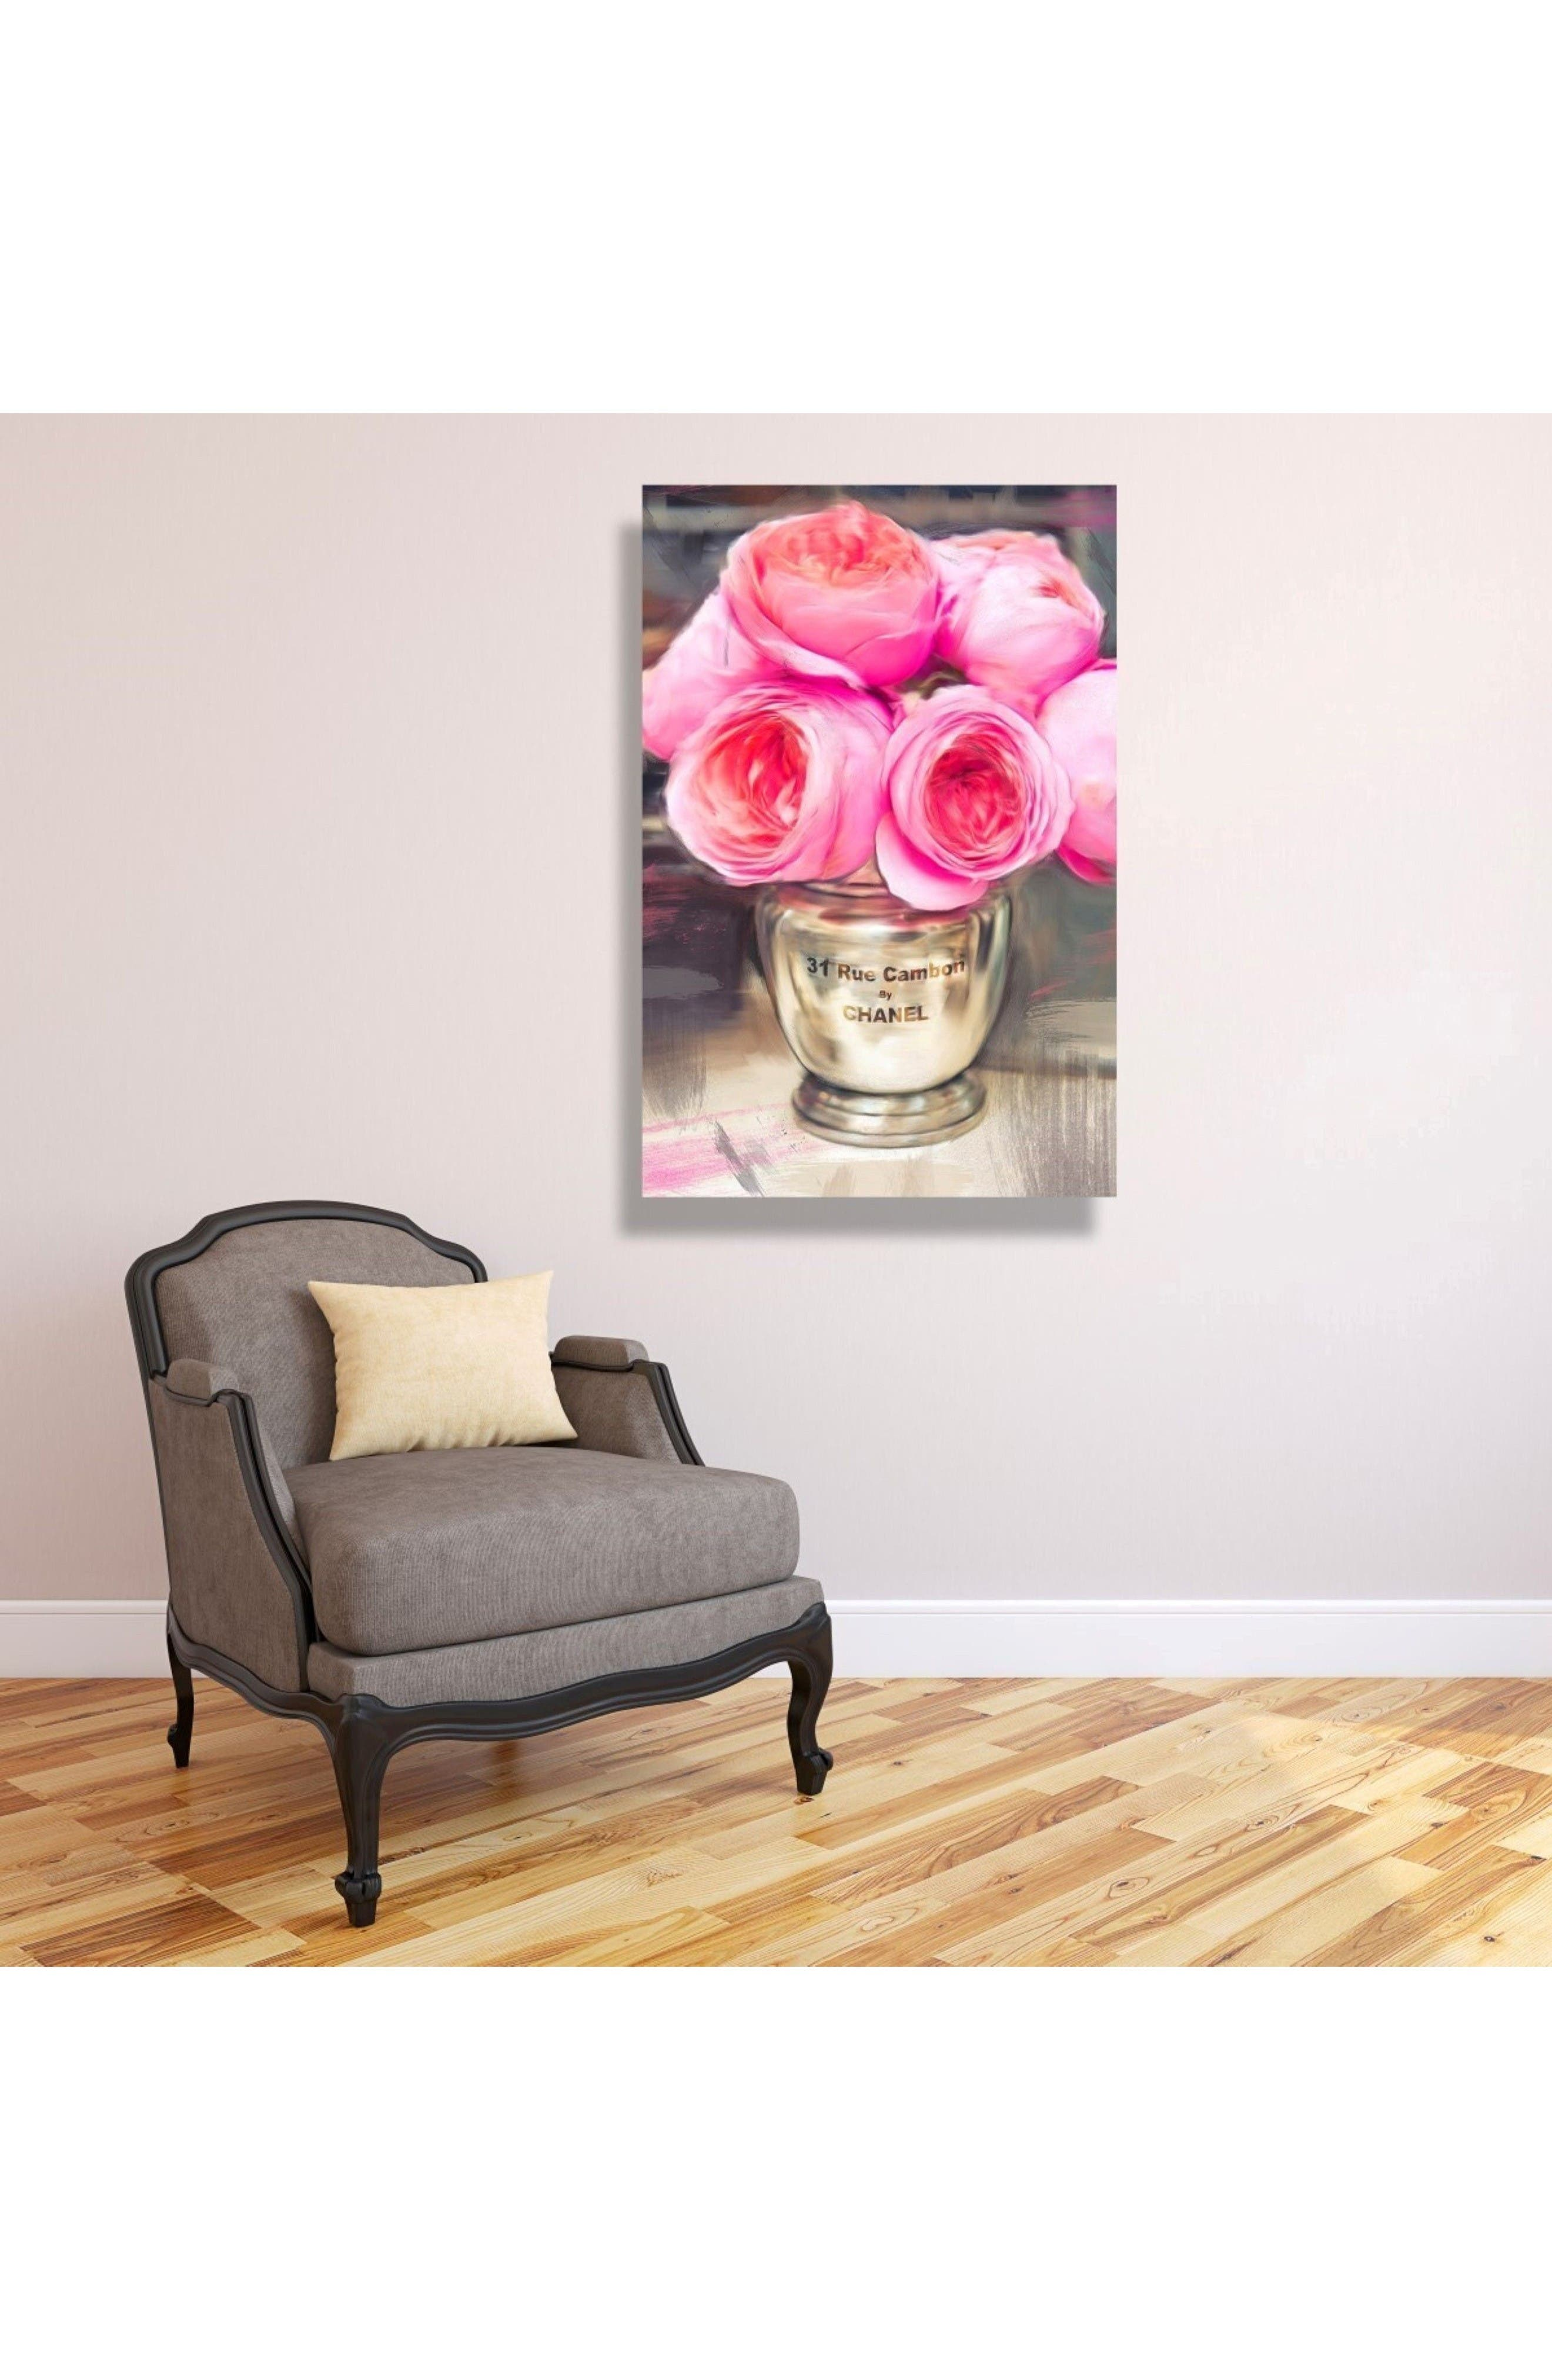 Rue Cambon Canvas Wall Art,                             Alternate thumbnail 2, color,                             Pink